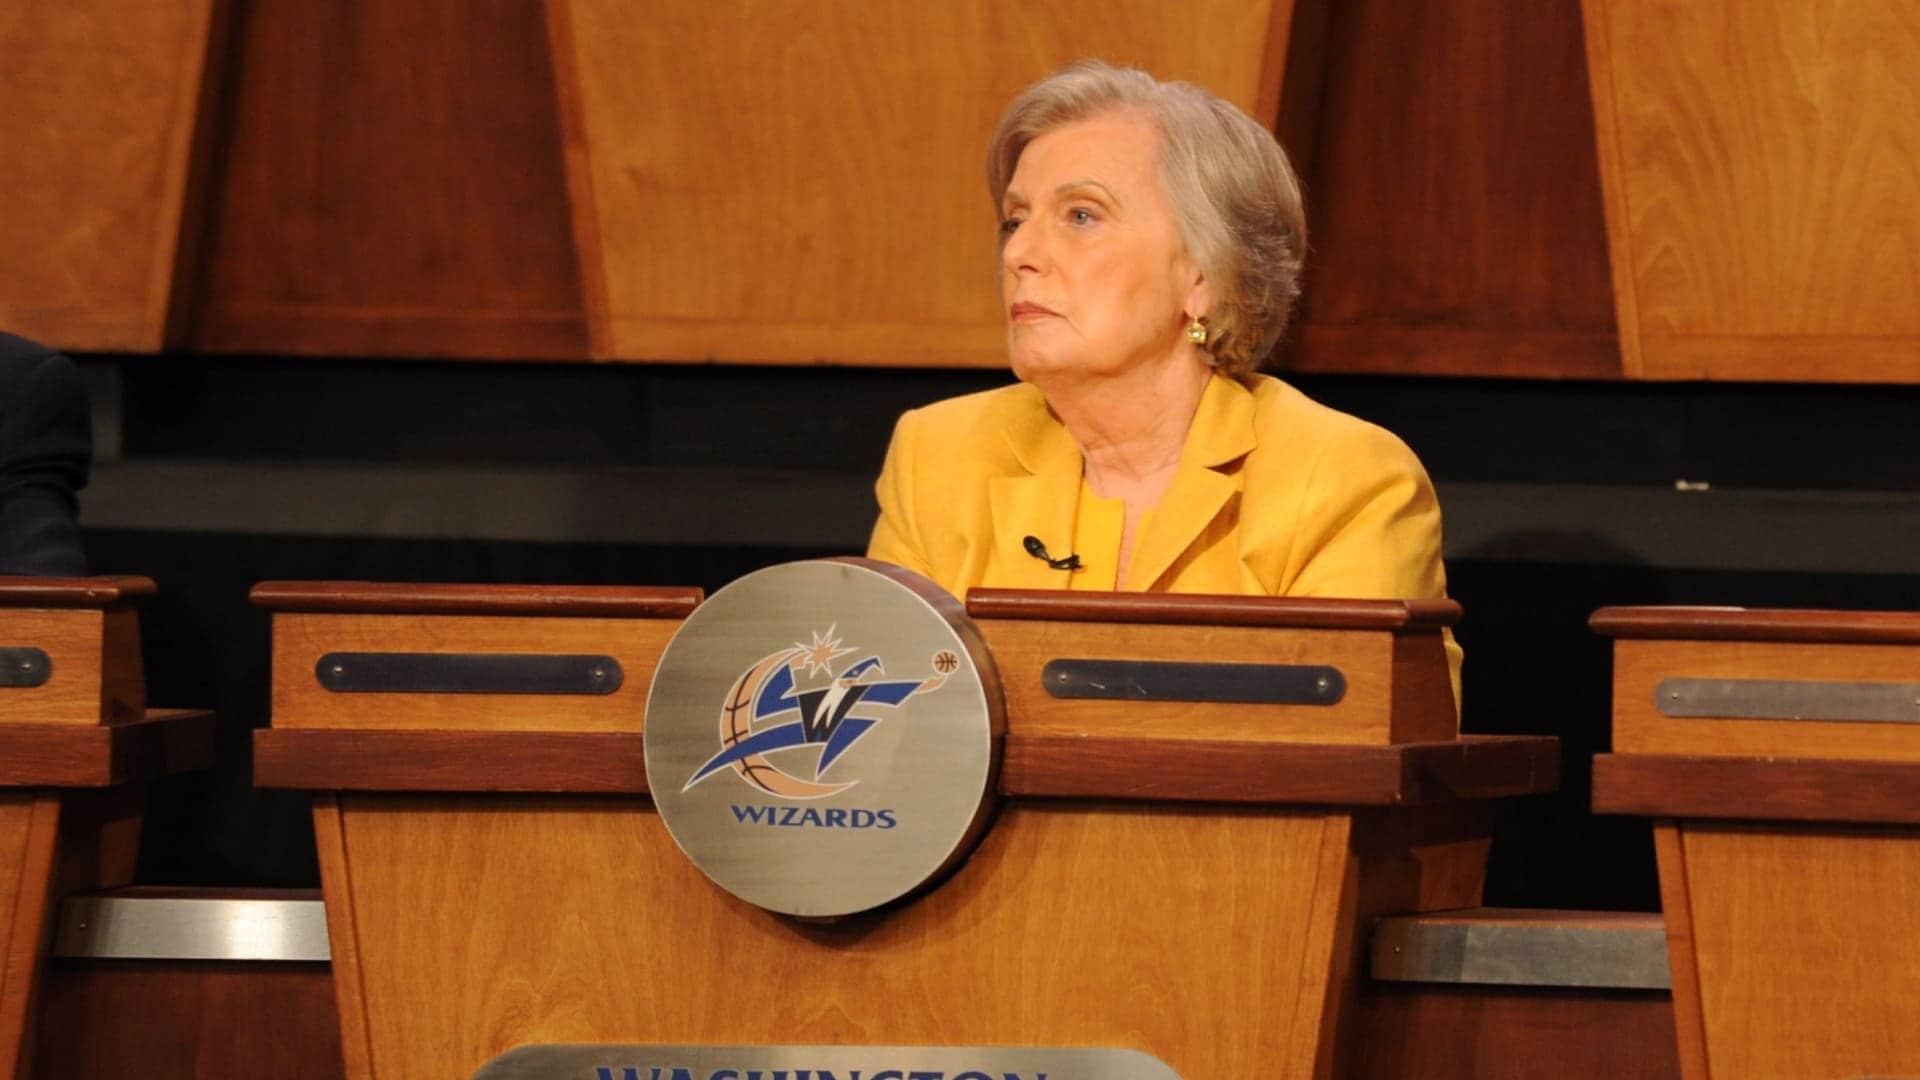 Ex-Wizards, Capitals co-owner Irene Pollin dies at 96